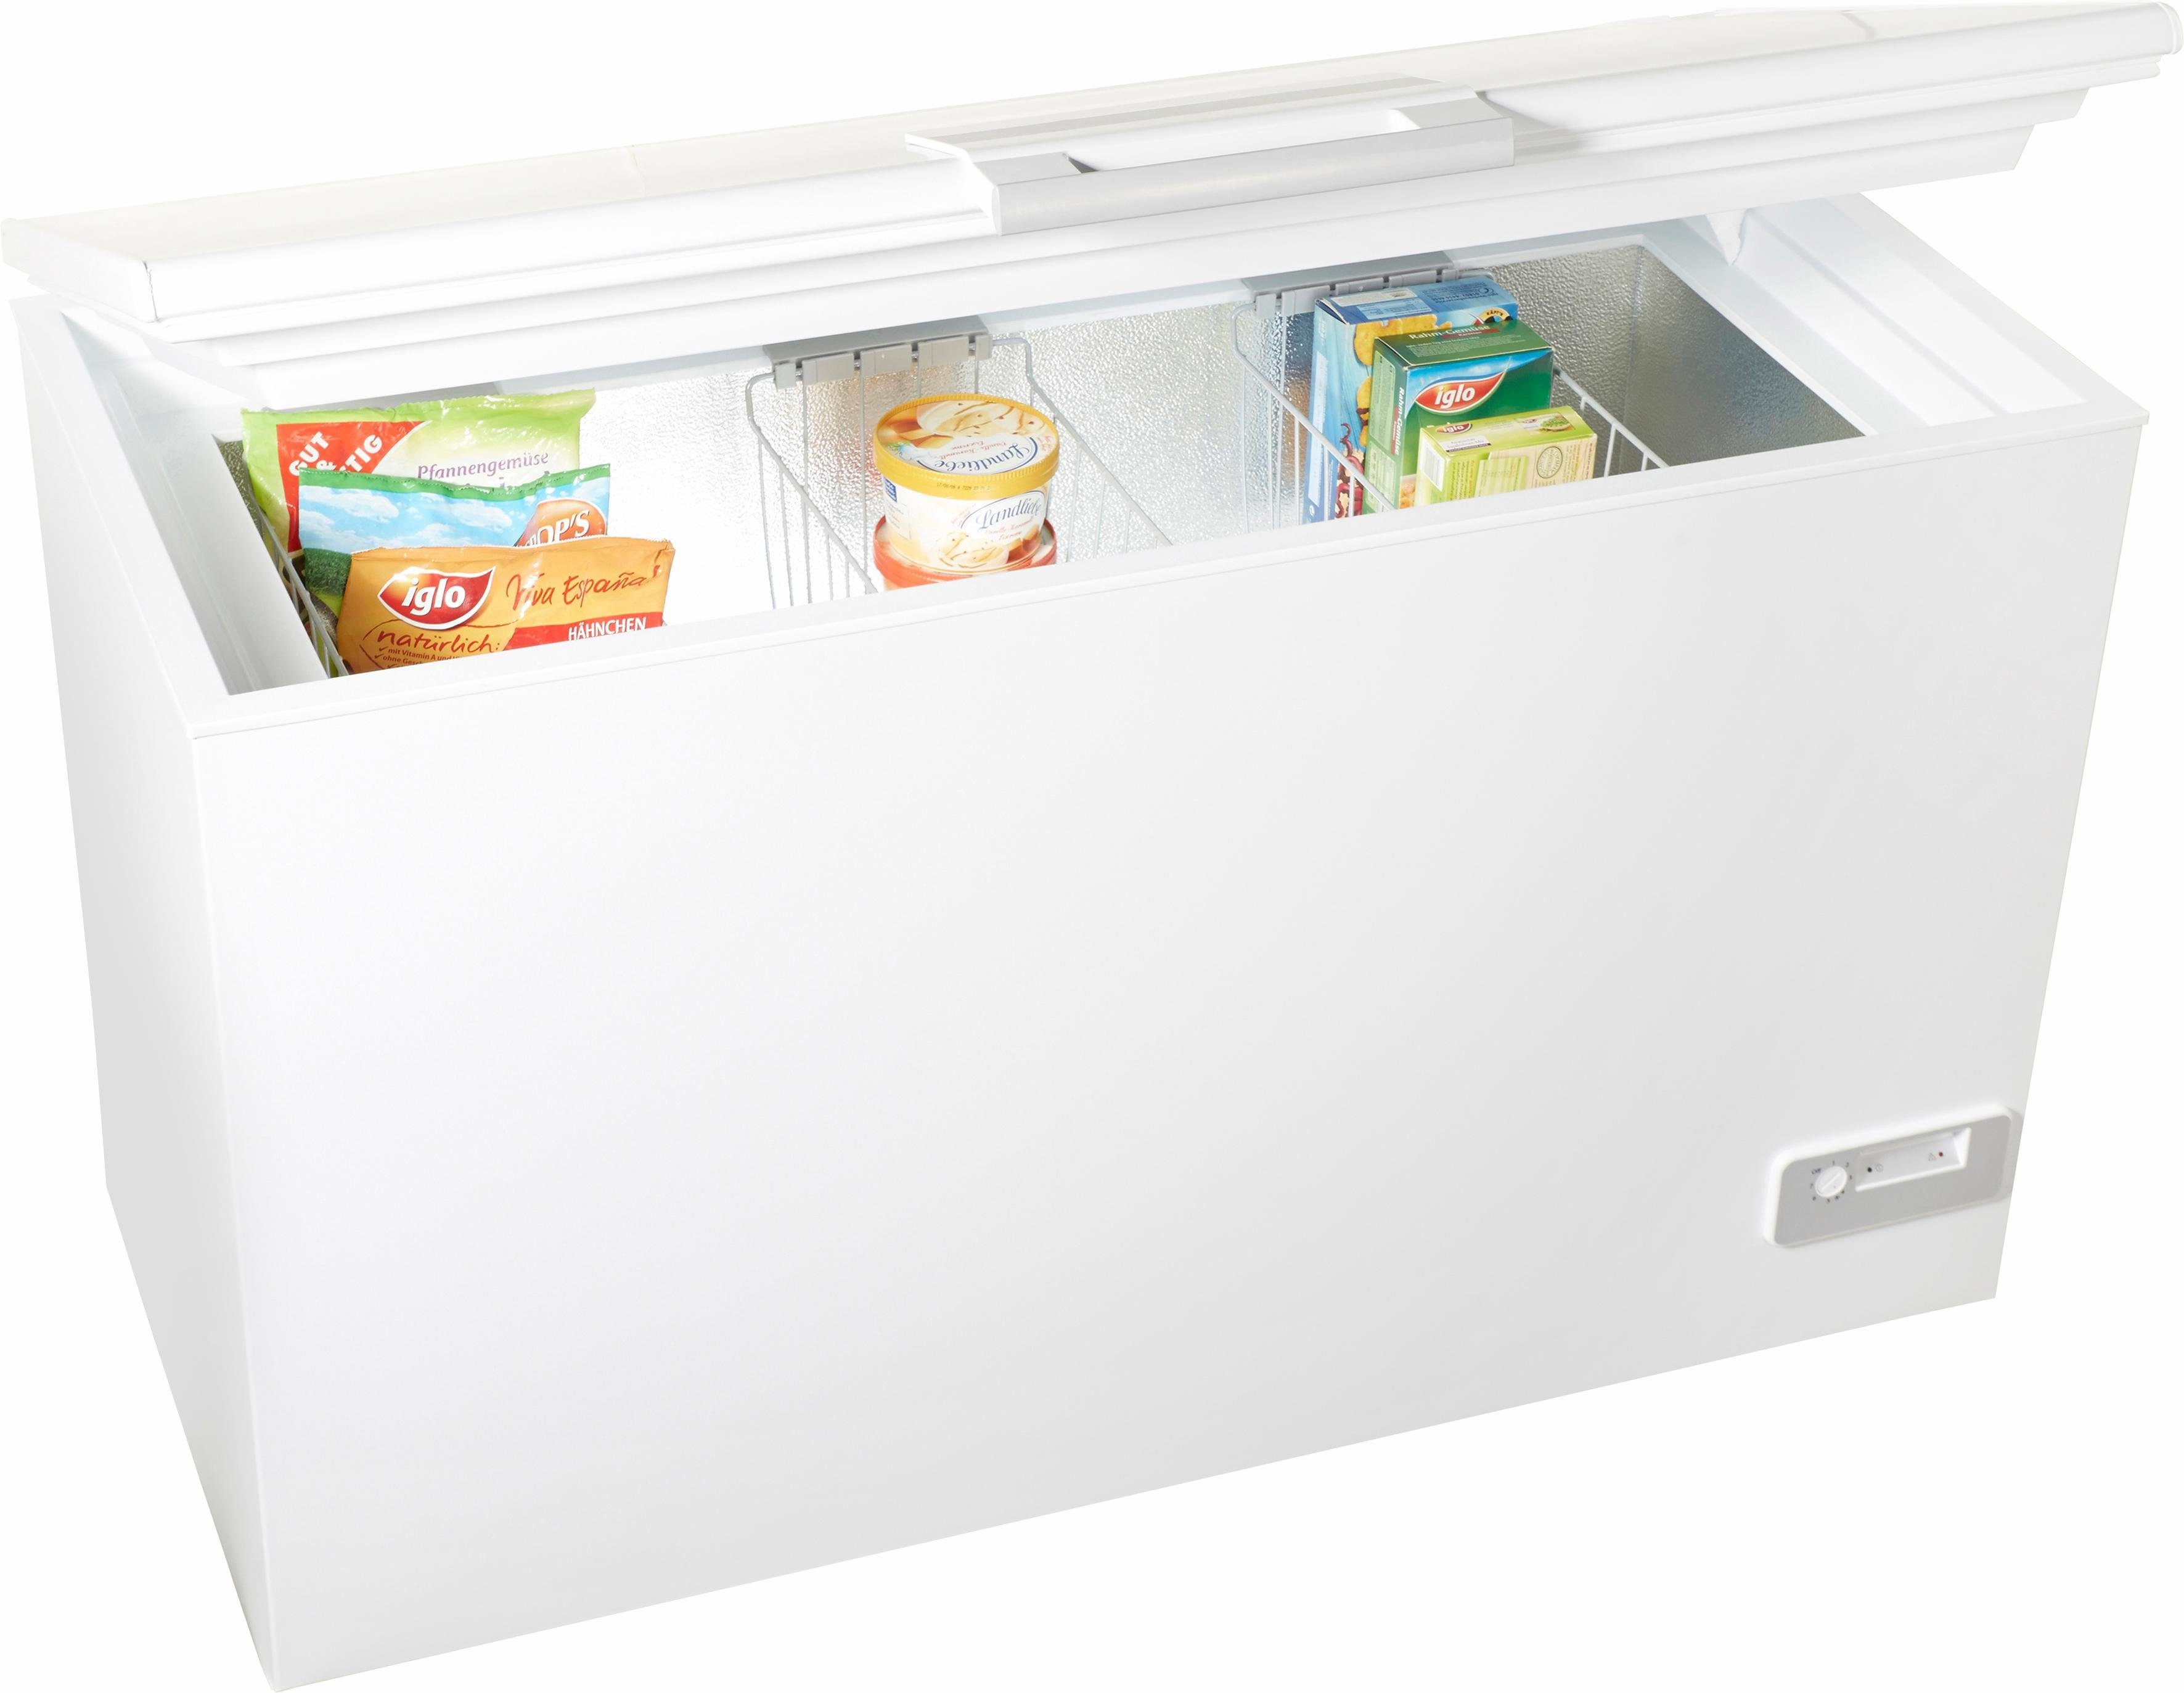 Aeg Kühlschrank Rkb64024dx : Aeg gefriertruhe ahb lw cm breit l otto